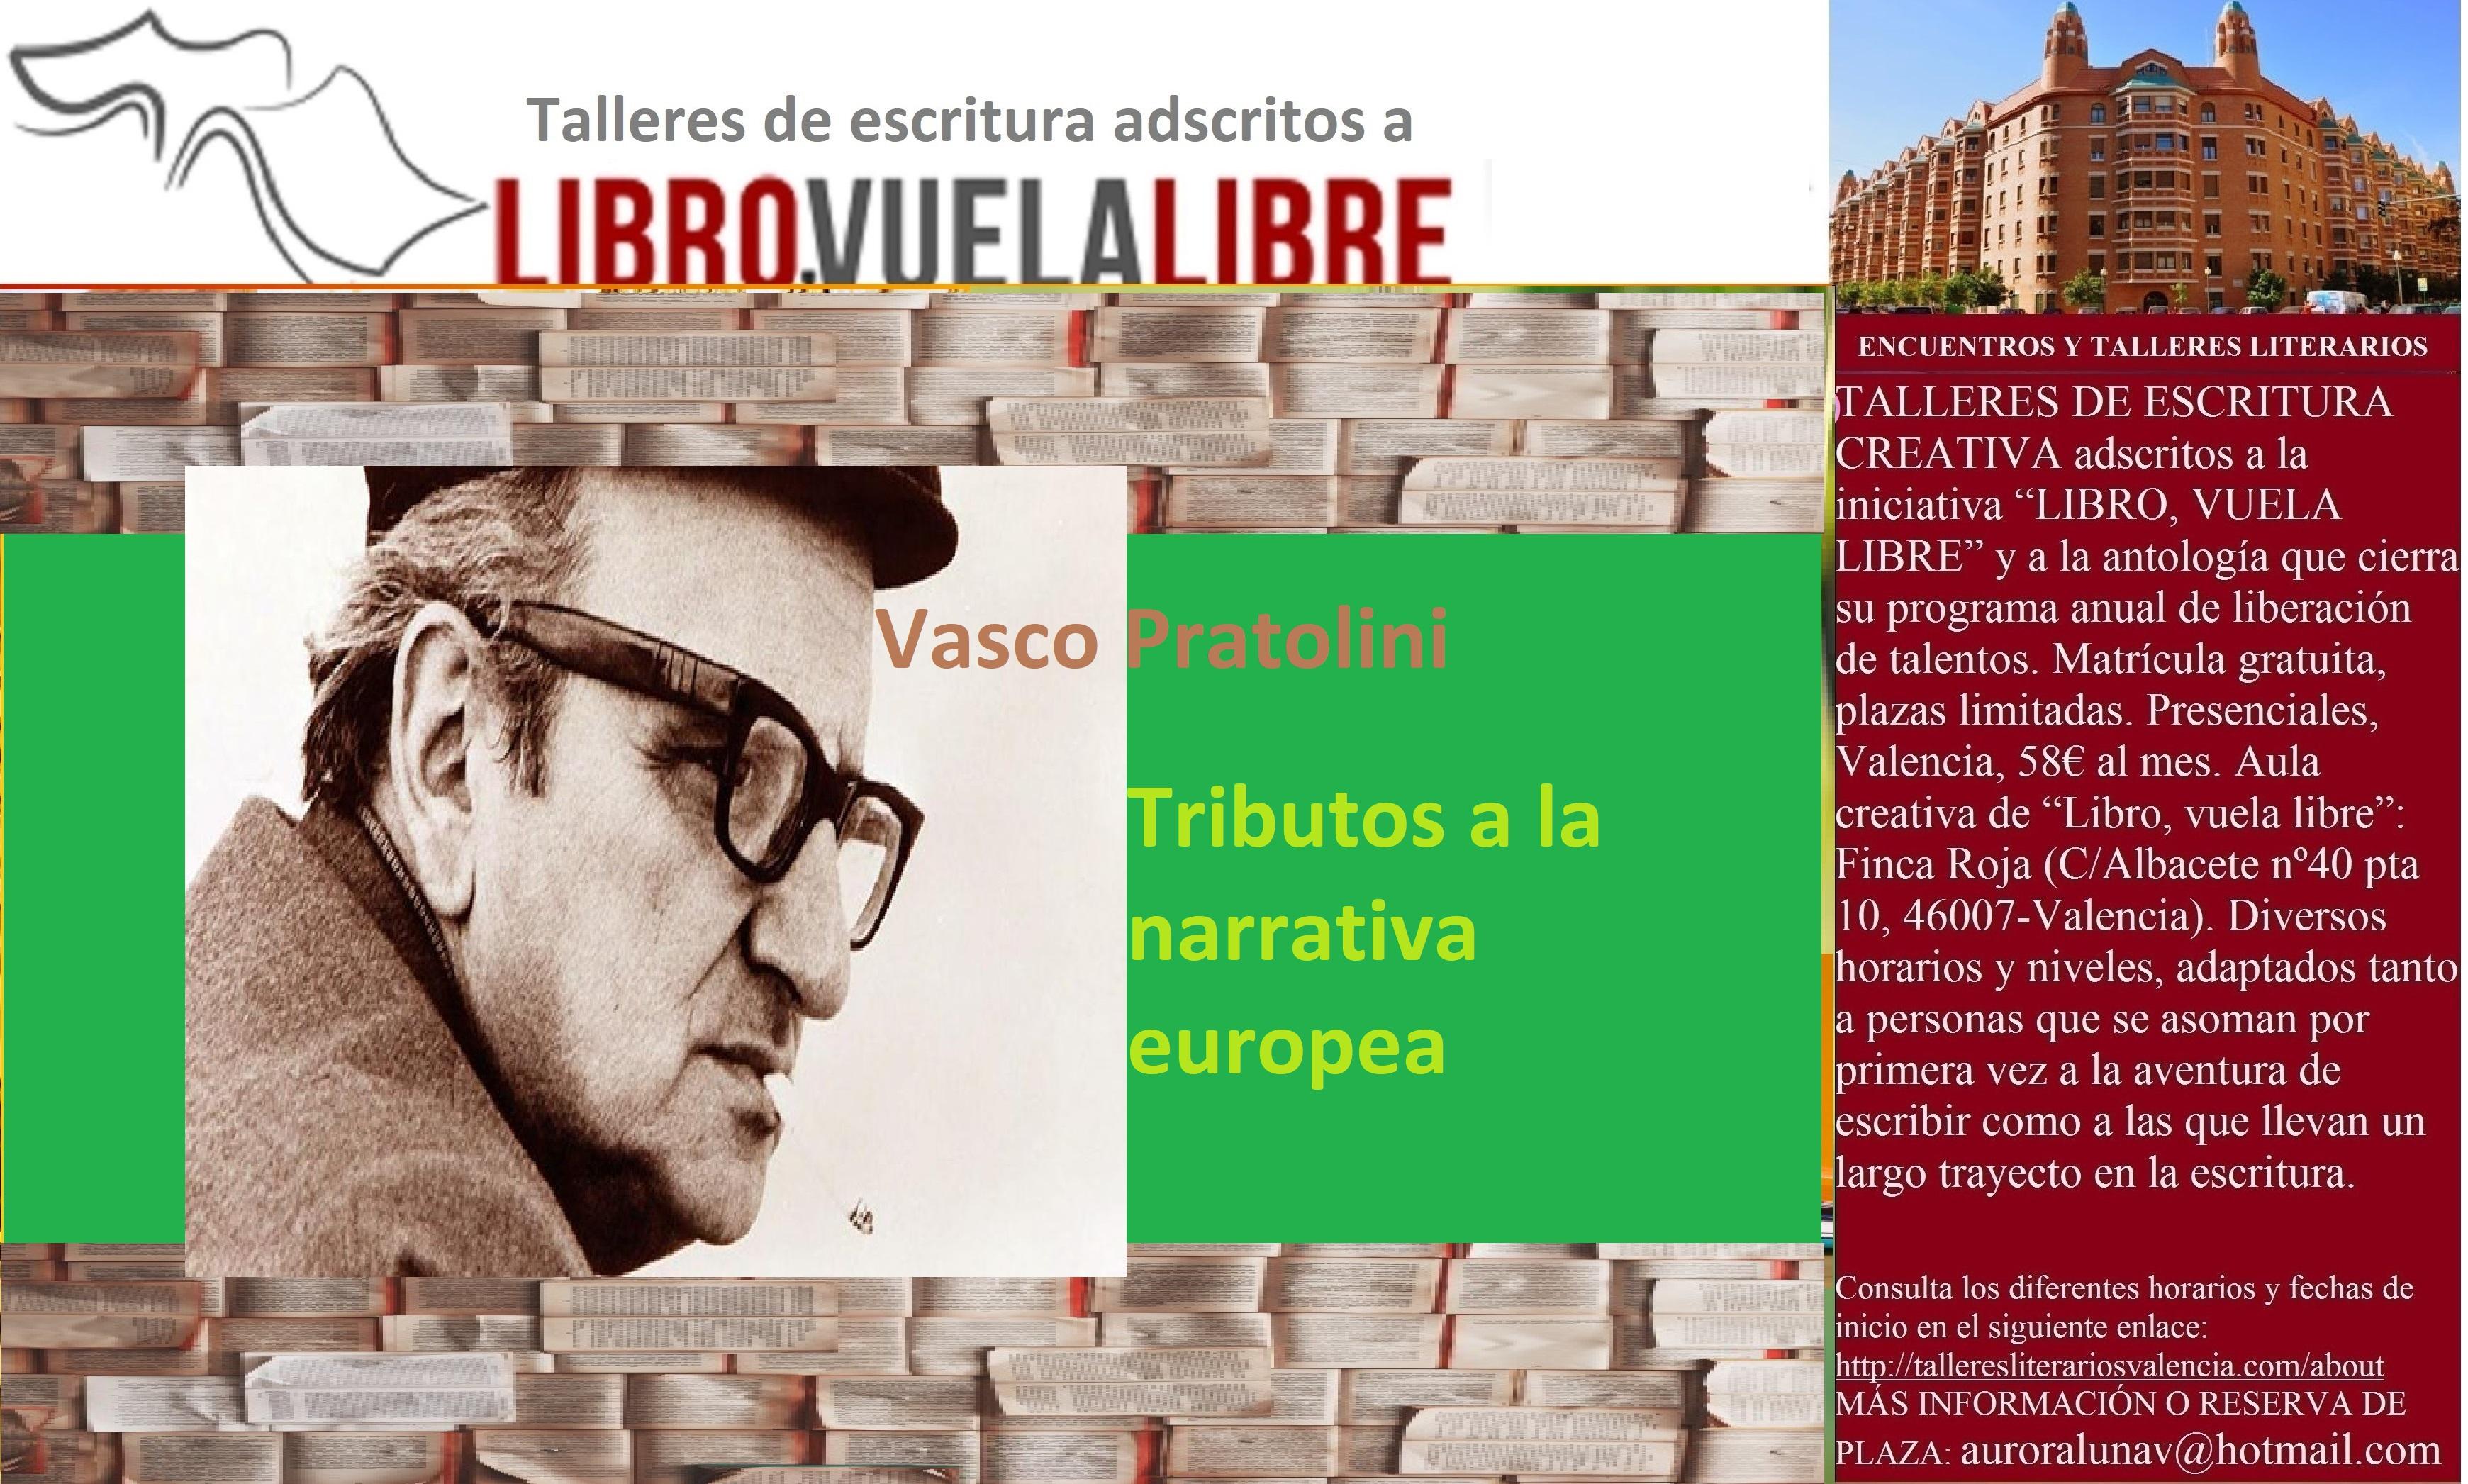 CRÓNICA DE POBRES AMANTES. Tributos de LIBRO, VUELA LIBRE